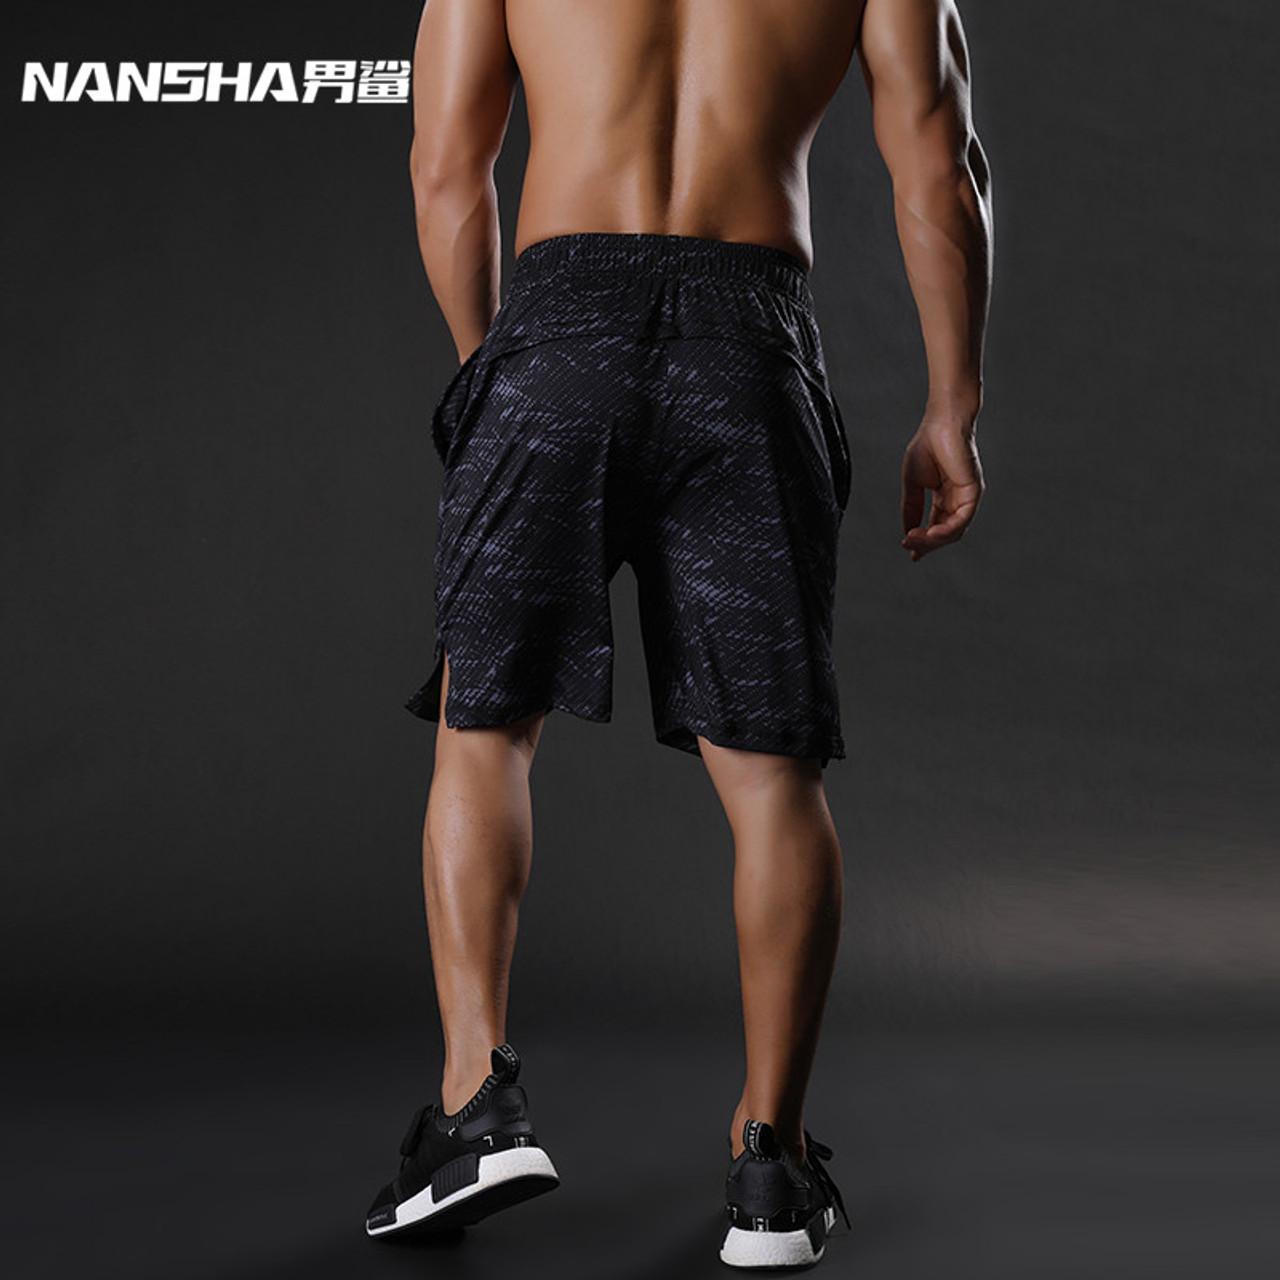 58f5a2f269a ... NANSHA Brand Mens Compression Shorts Summer Python Bermuda Shorts Gyms Fitness  Men Cossfit Bodybuilding Tights Camo ...